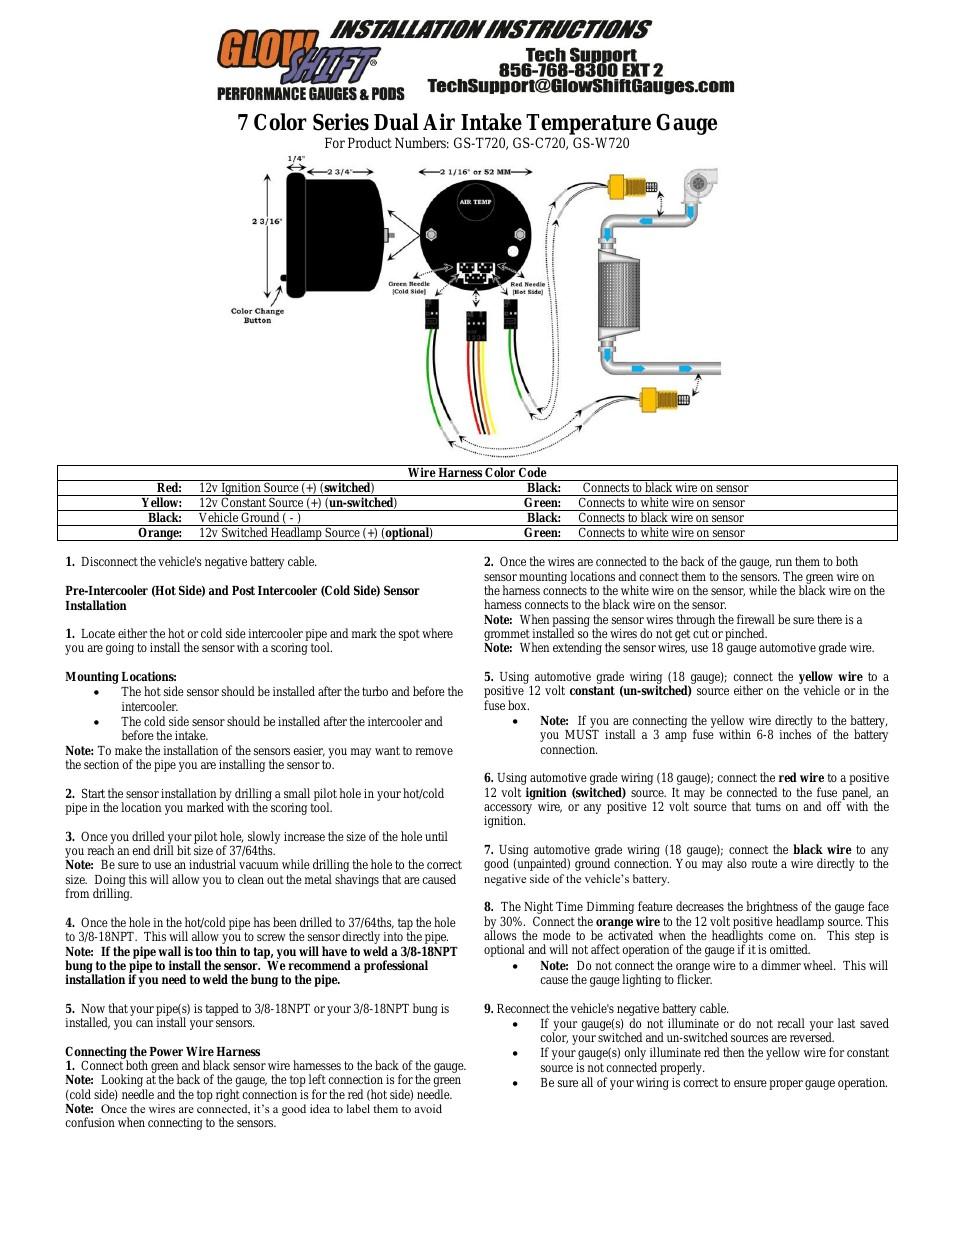 Glowshift Air Pressure Gauge Wiring Diagram